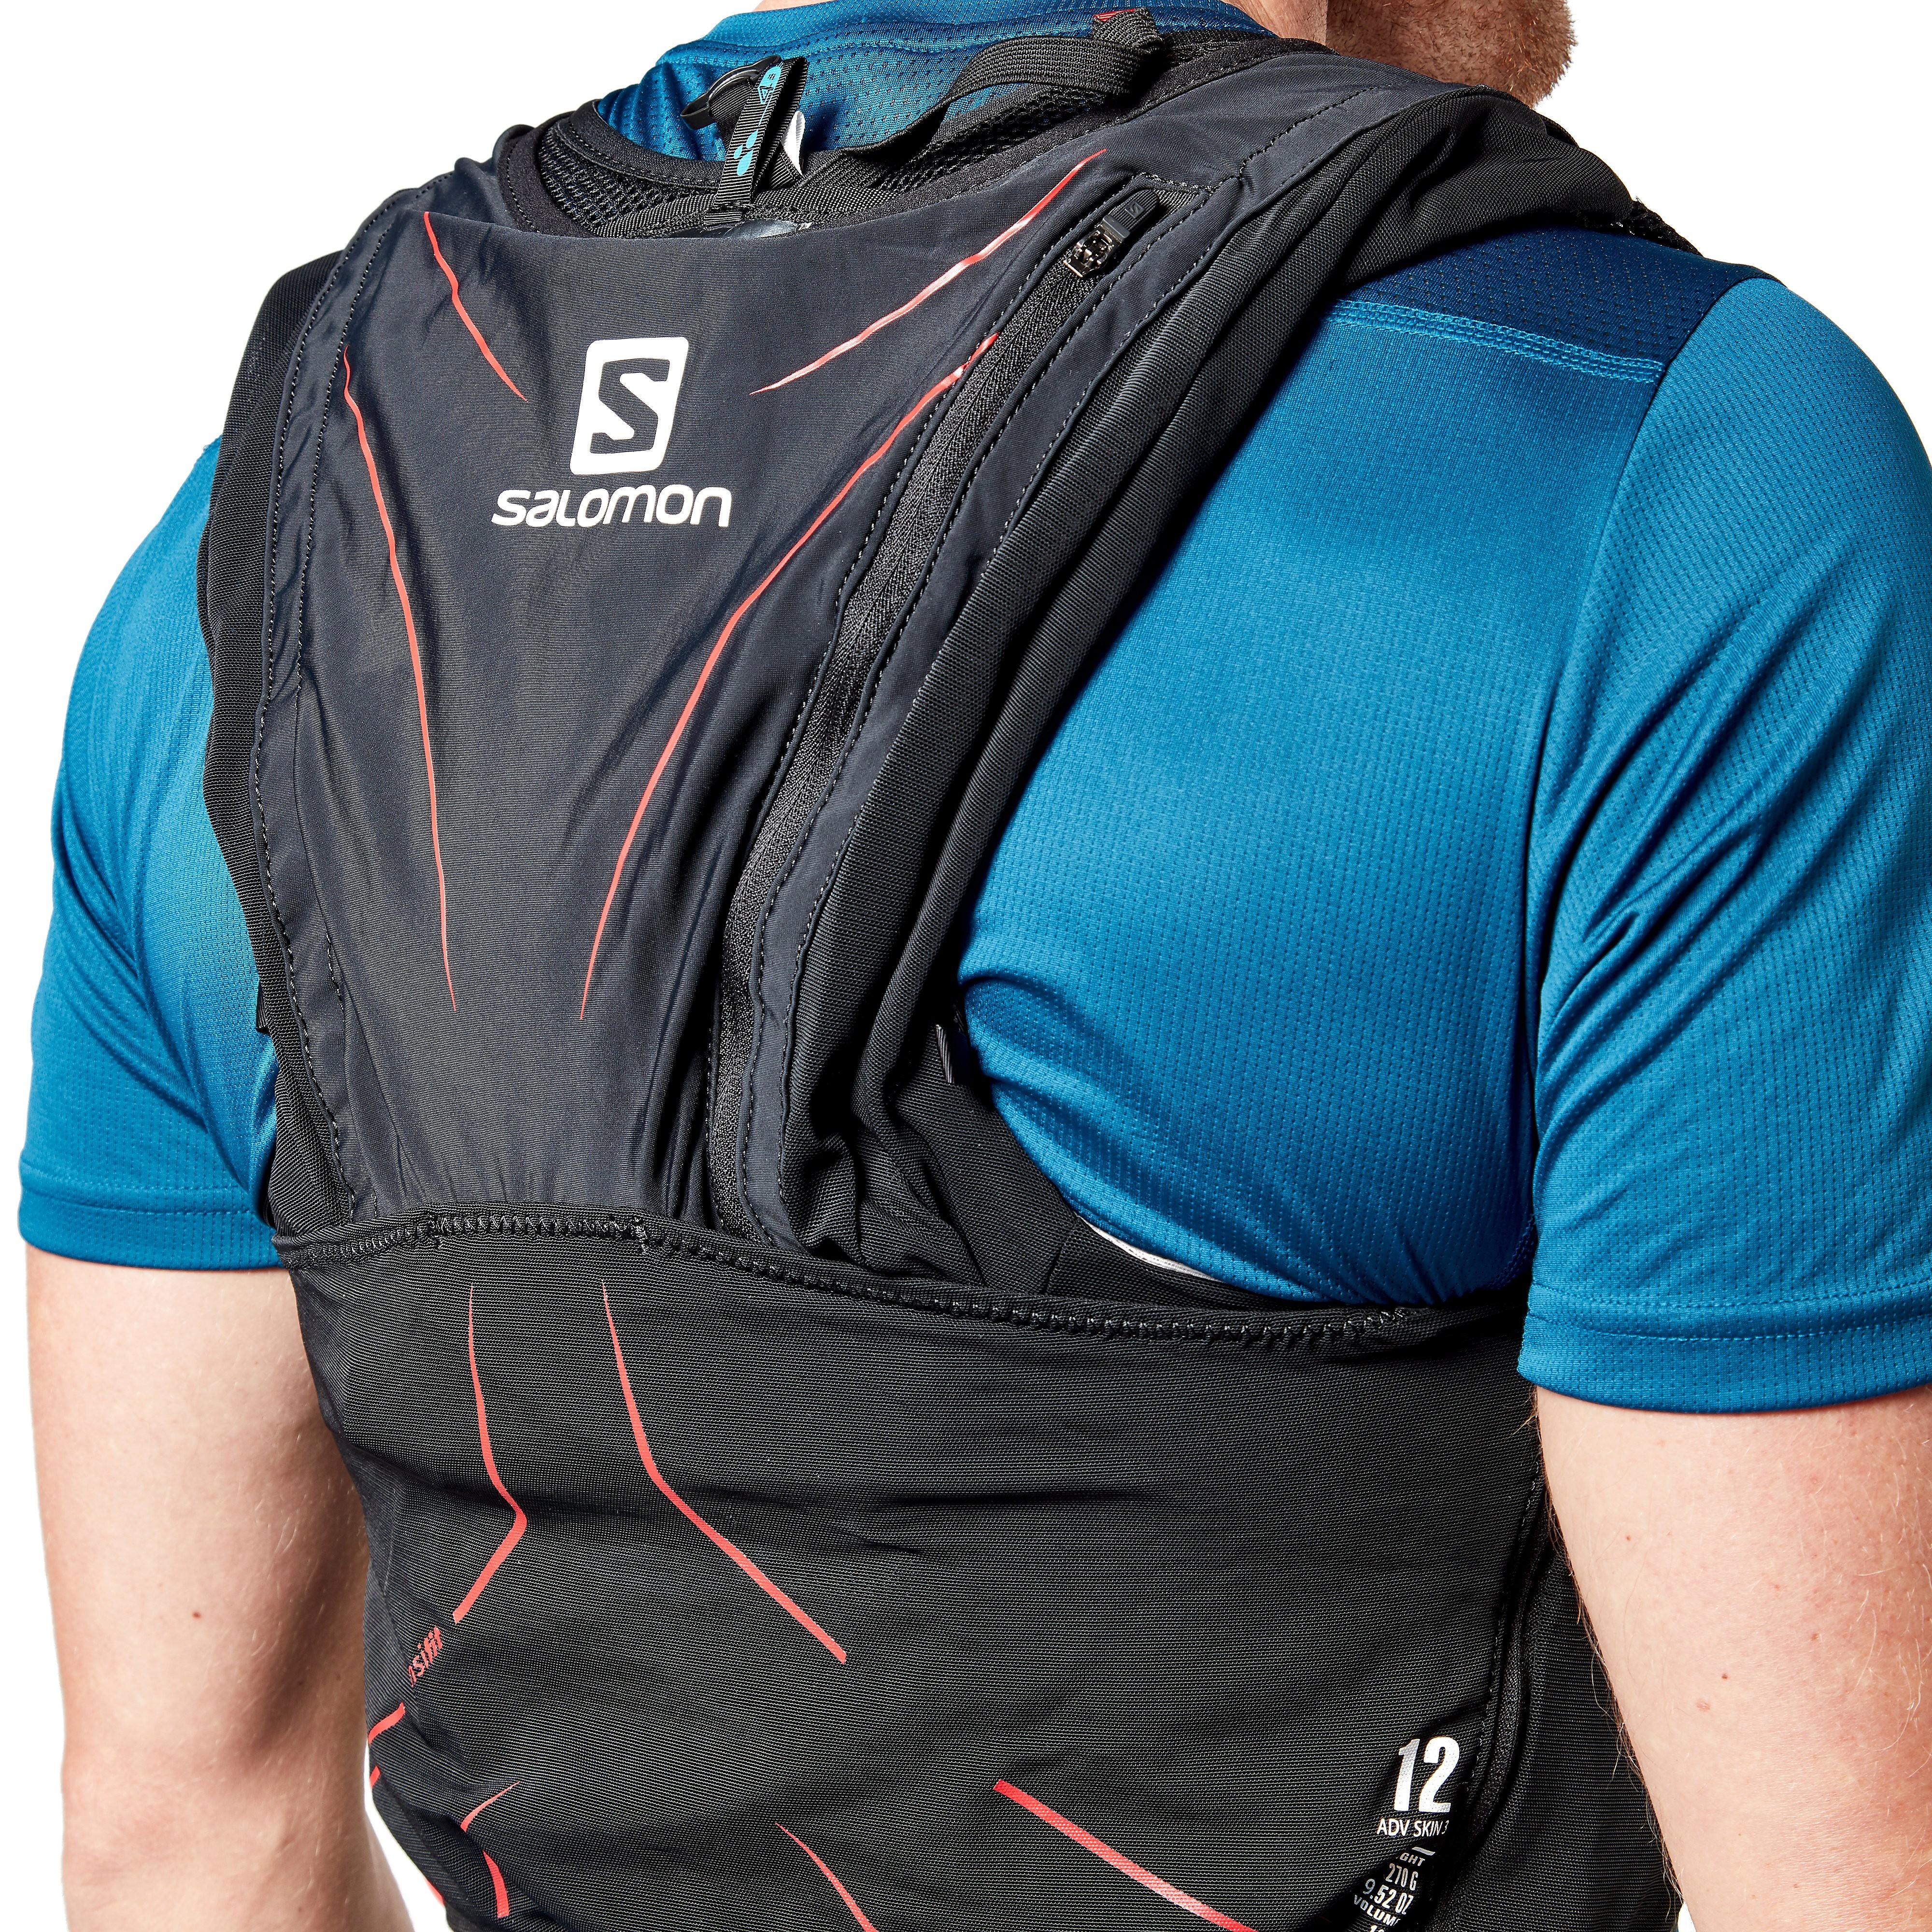 Salomon Advance Skin Unisex 12 Hydration Set